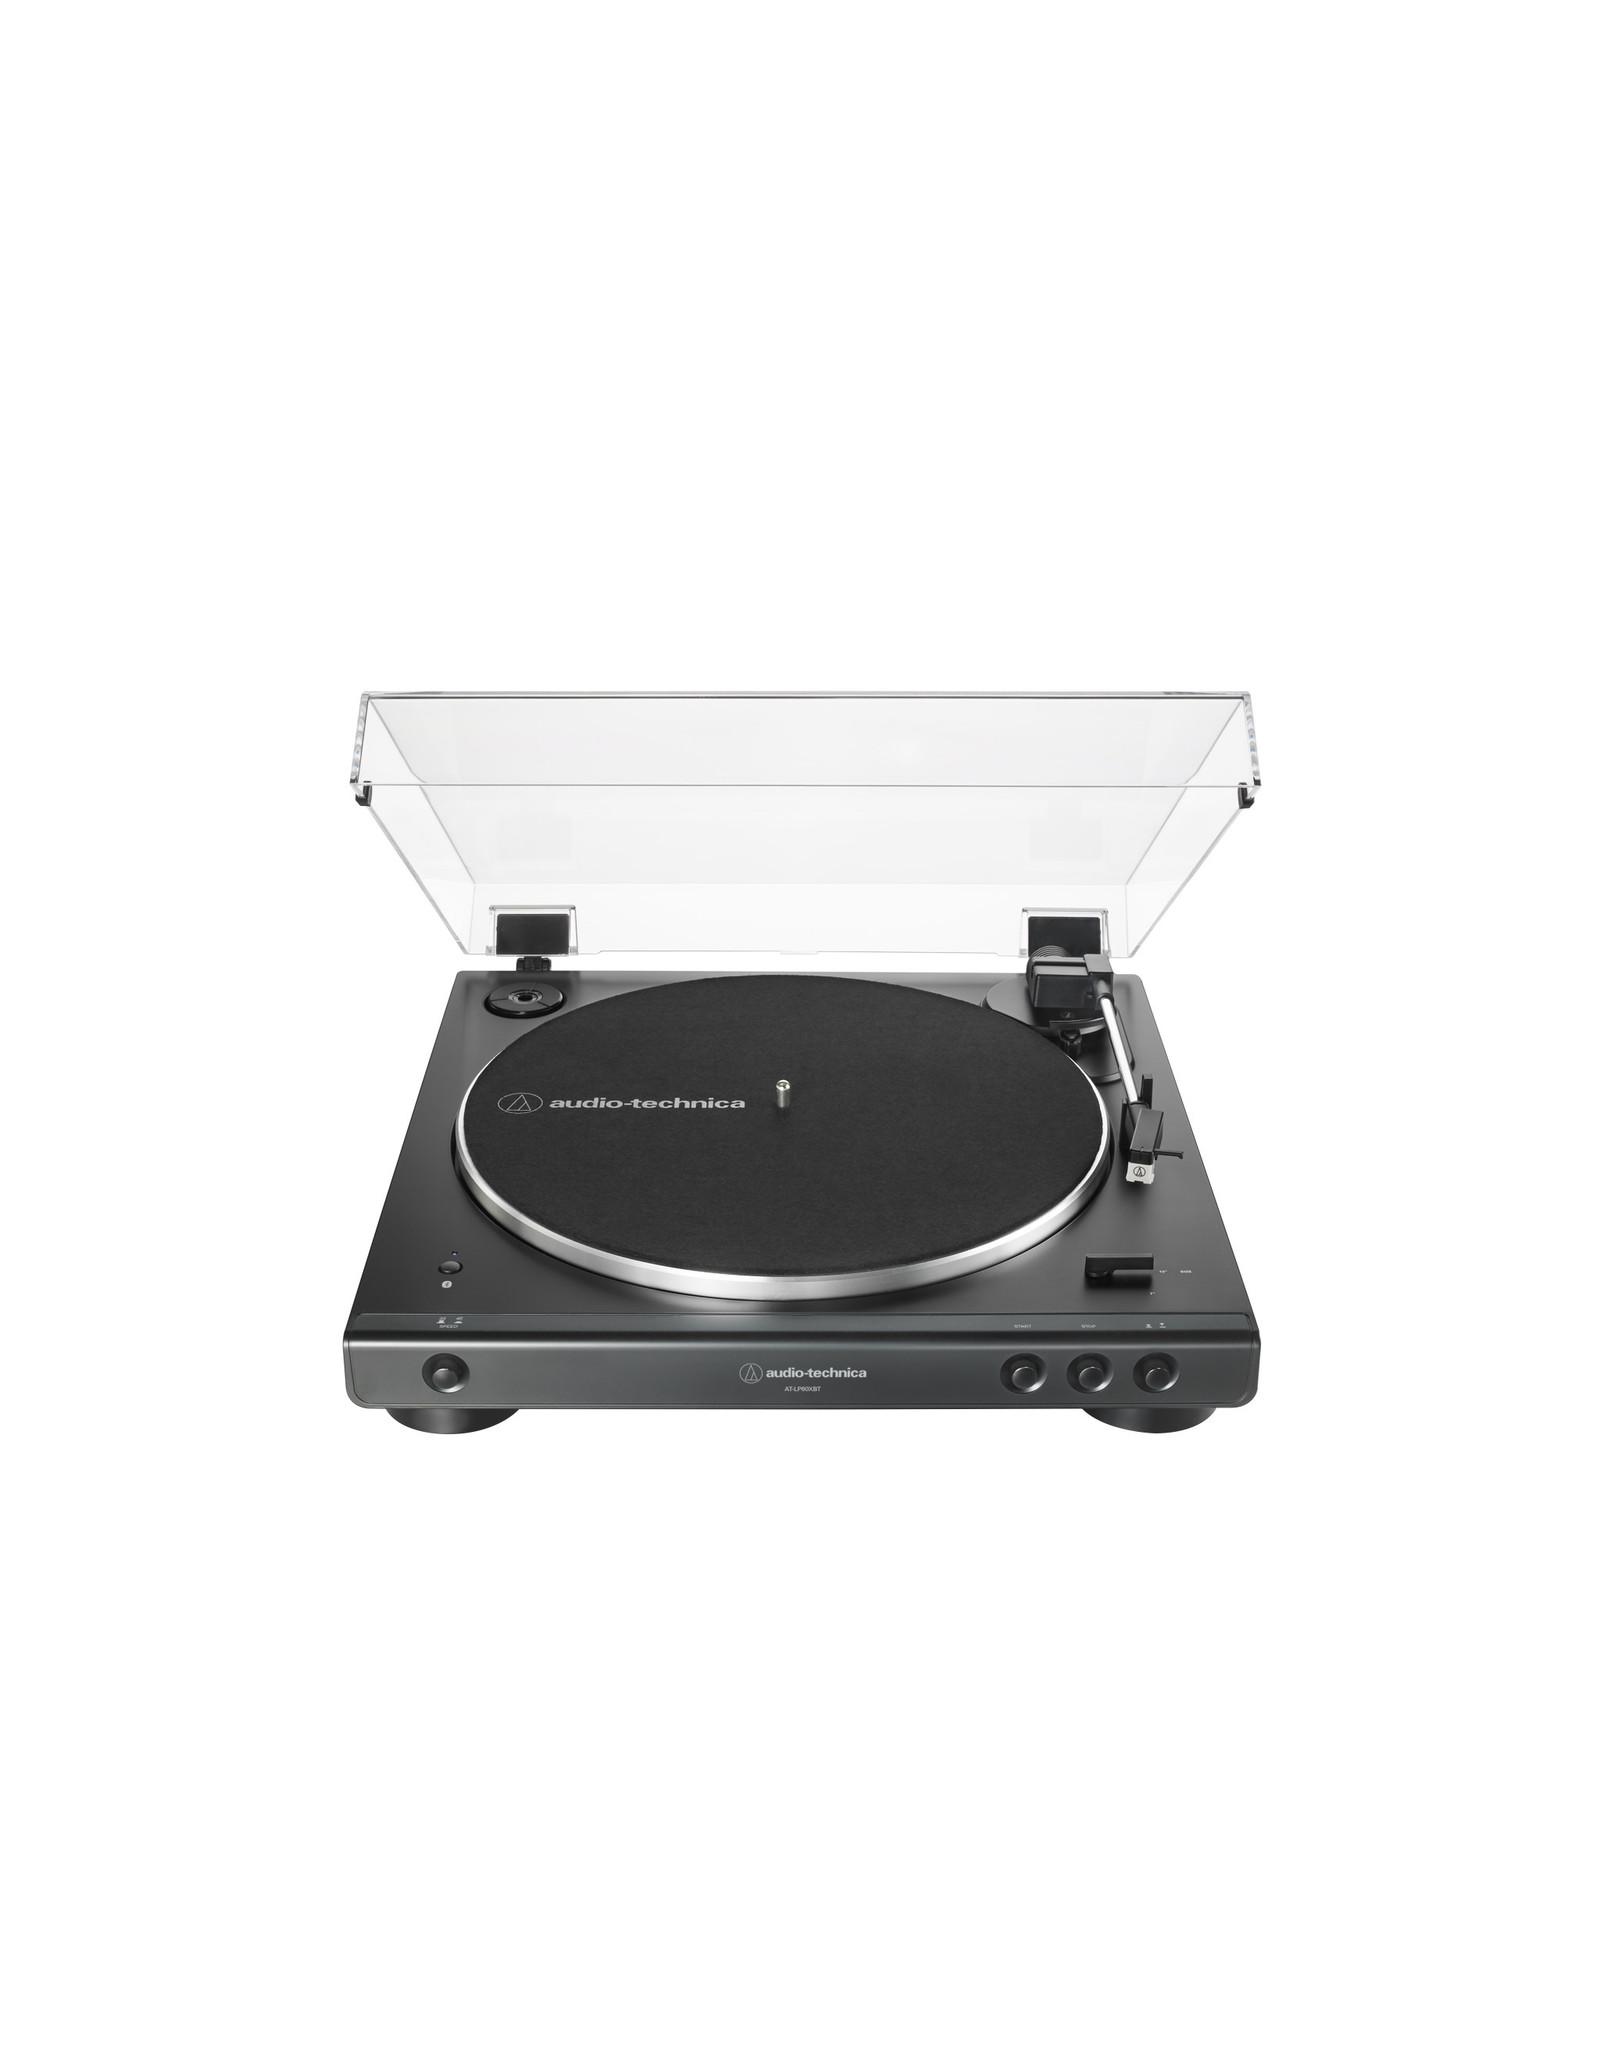 Audio-Technica Audio-Technica AT-LP60XBT Bluetooth Turntable